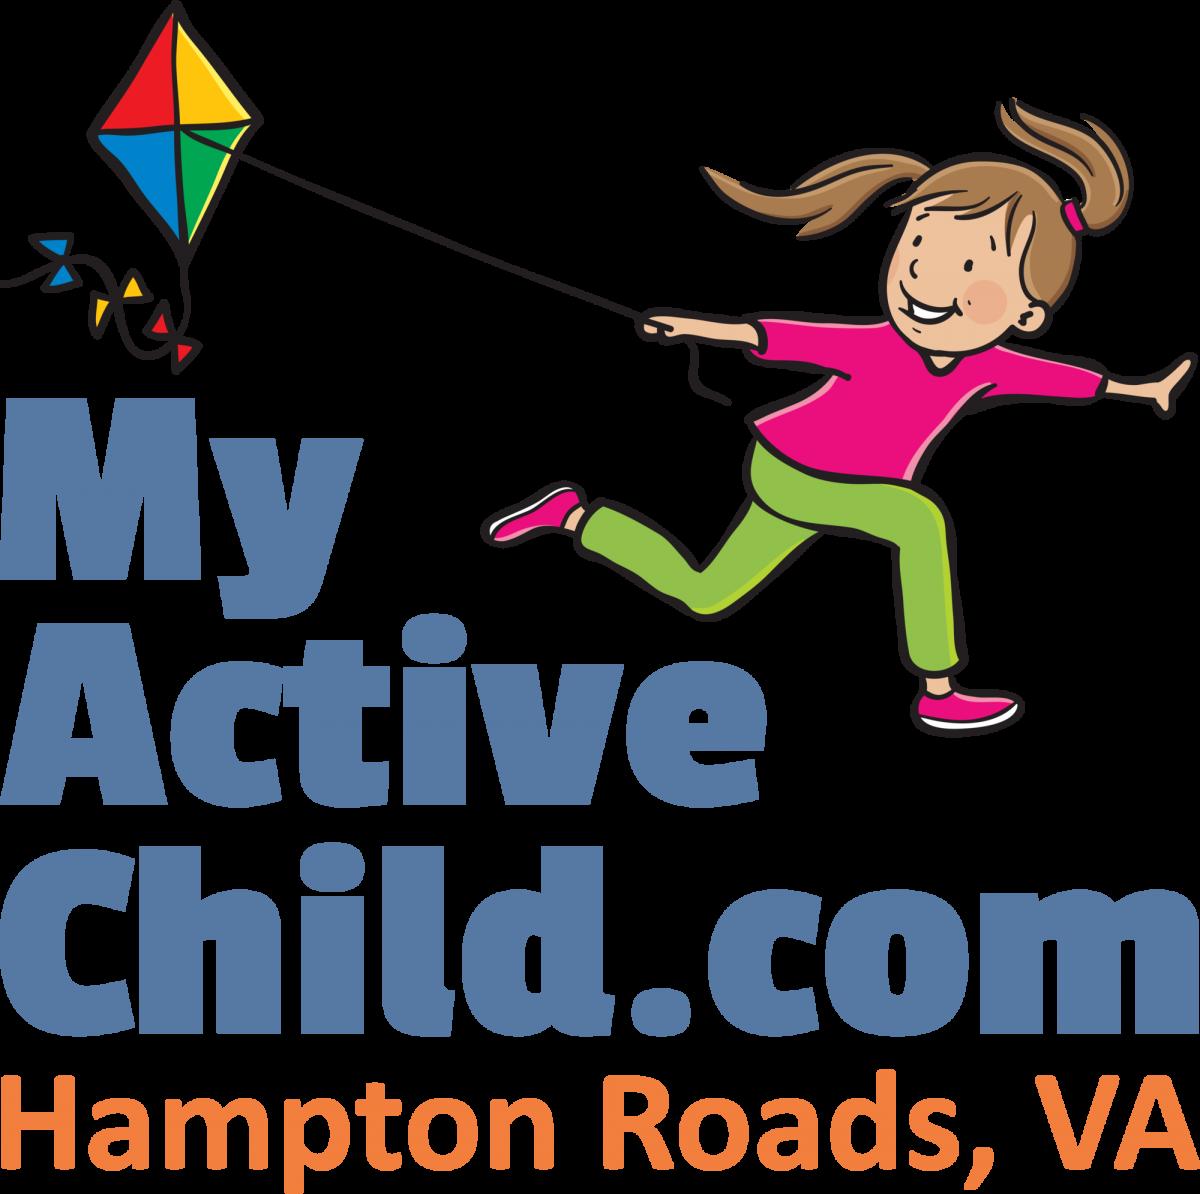 The myactivechild hampton roads. Fair clipart family fun